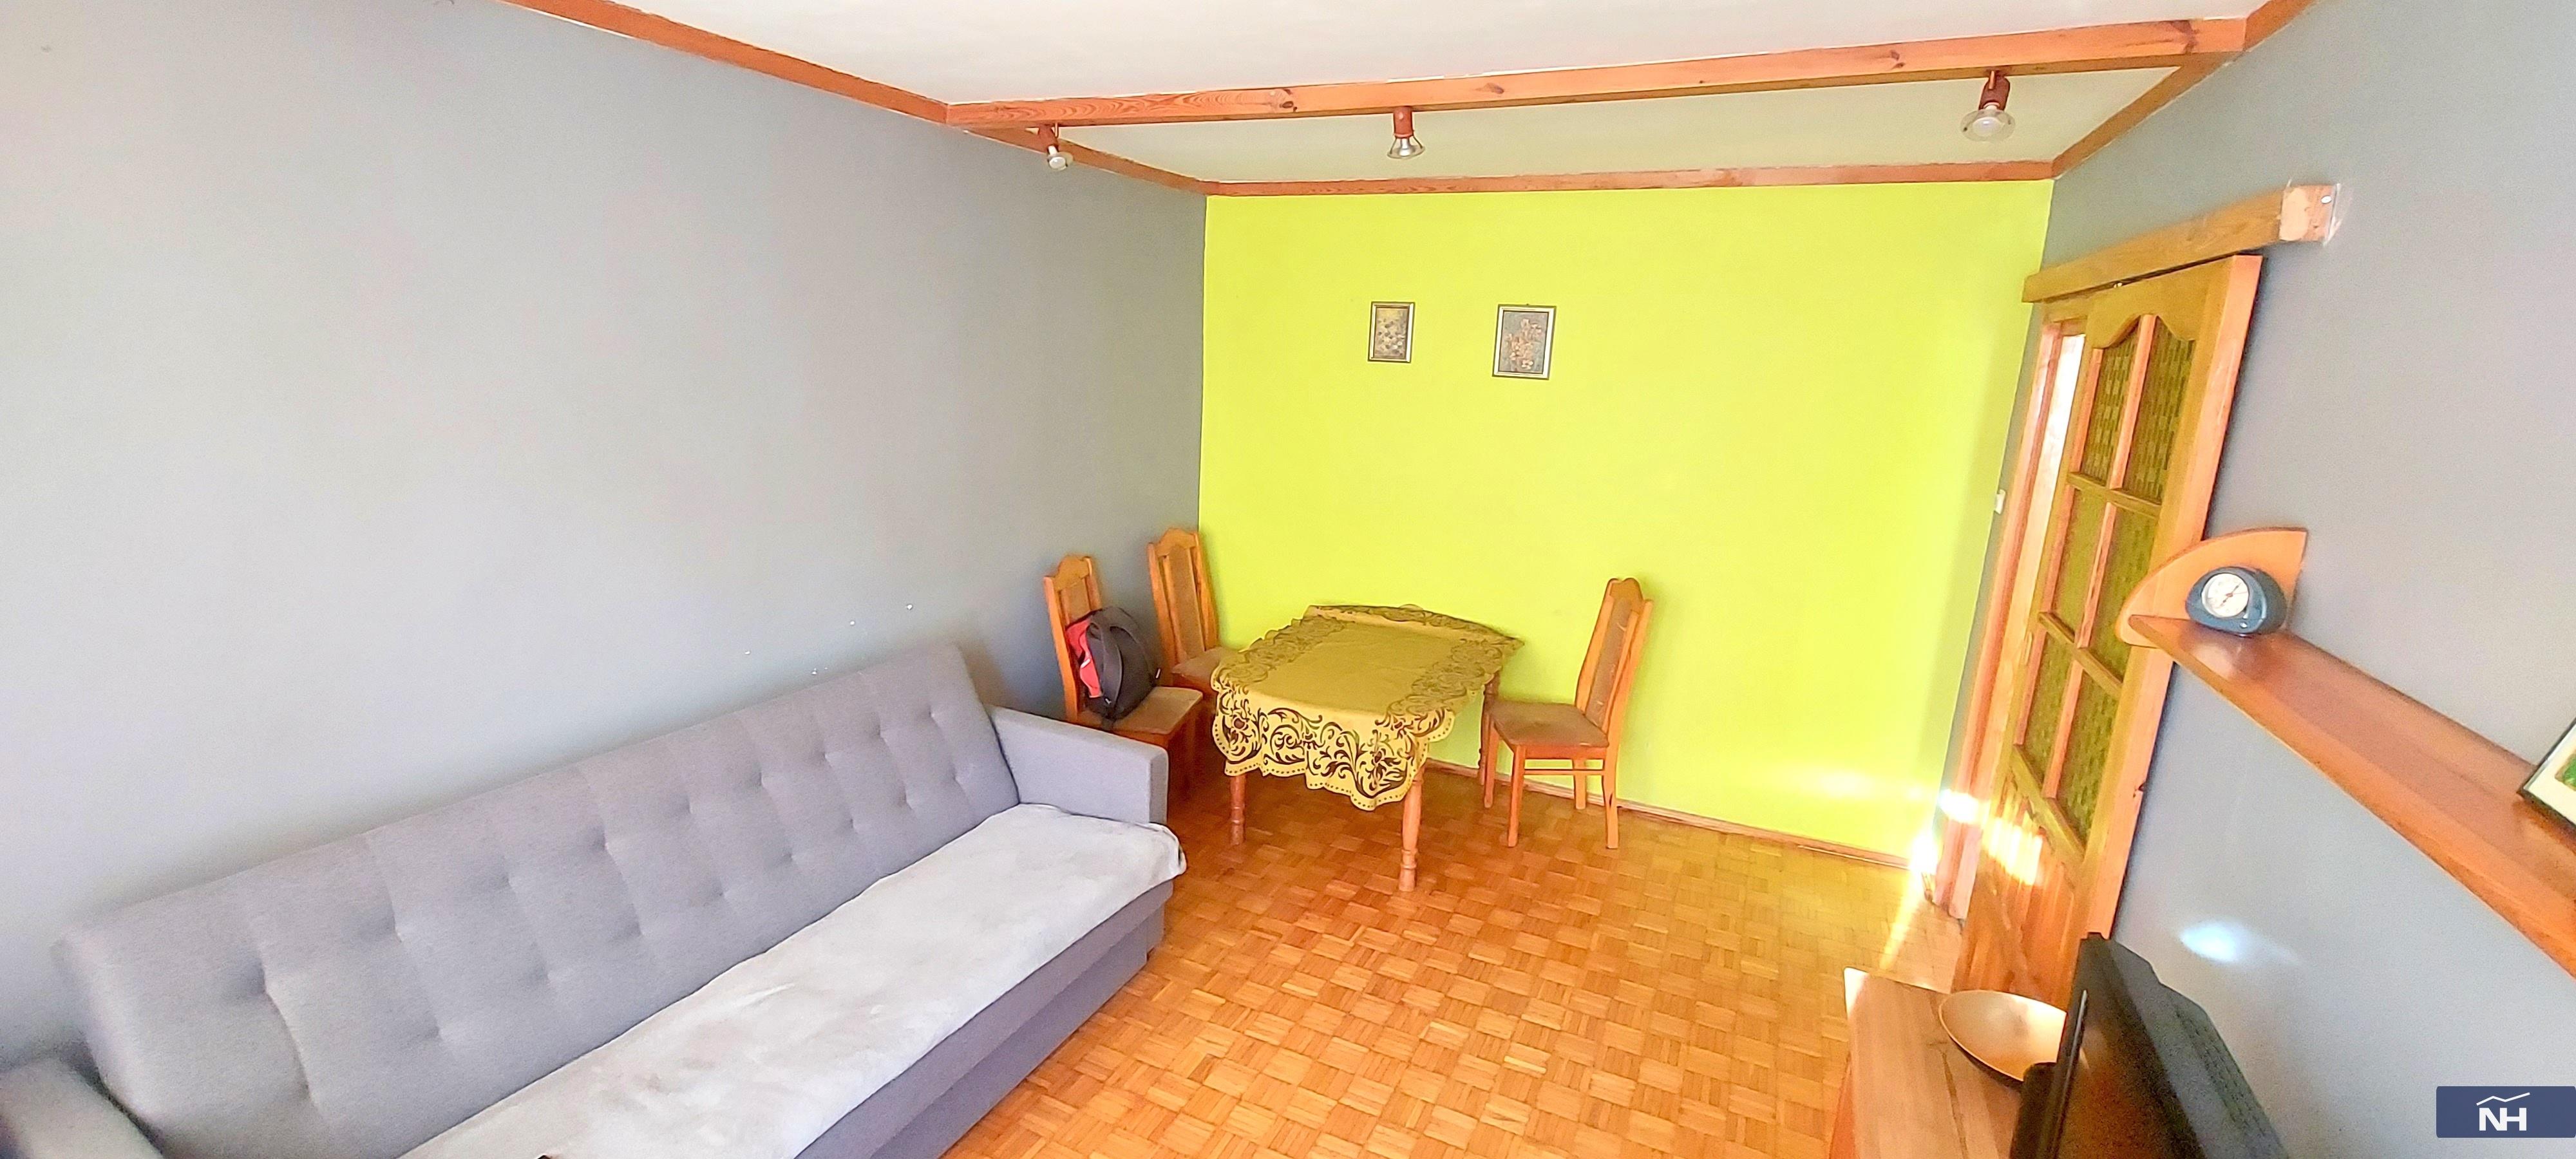 4 pokoje na Kapuściskach